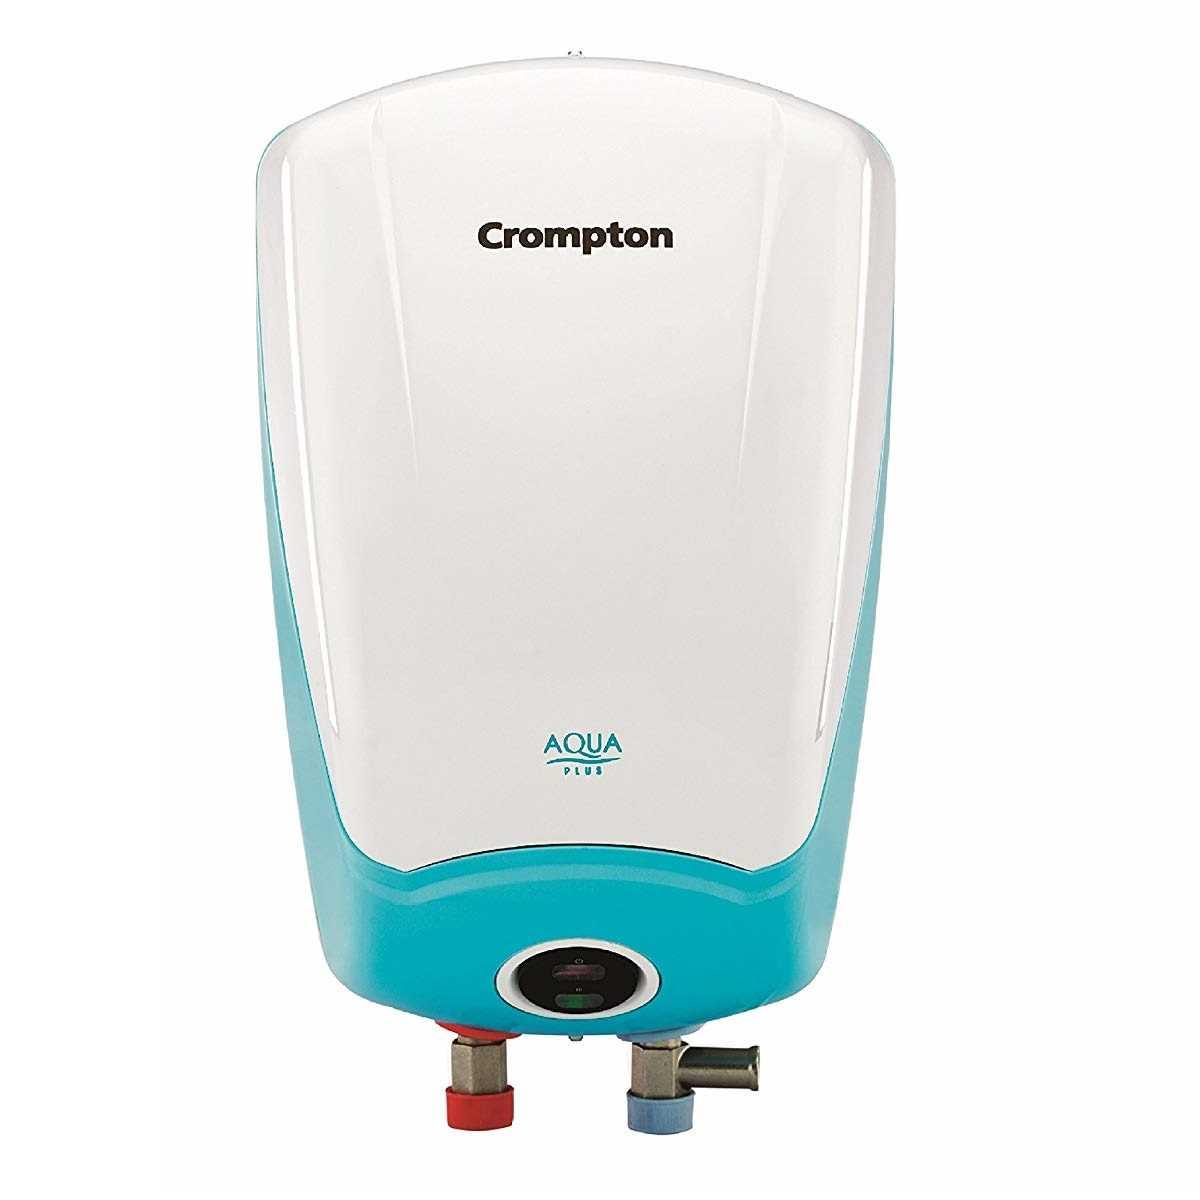 Crompton Aqua Plus 3 Litre Instant Water Geyser